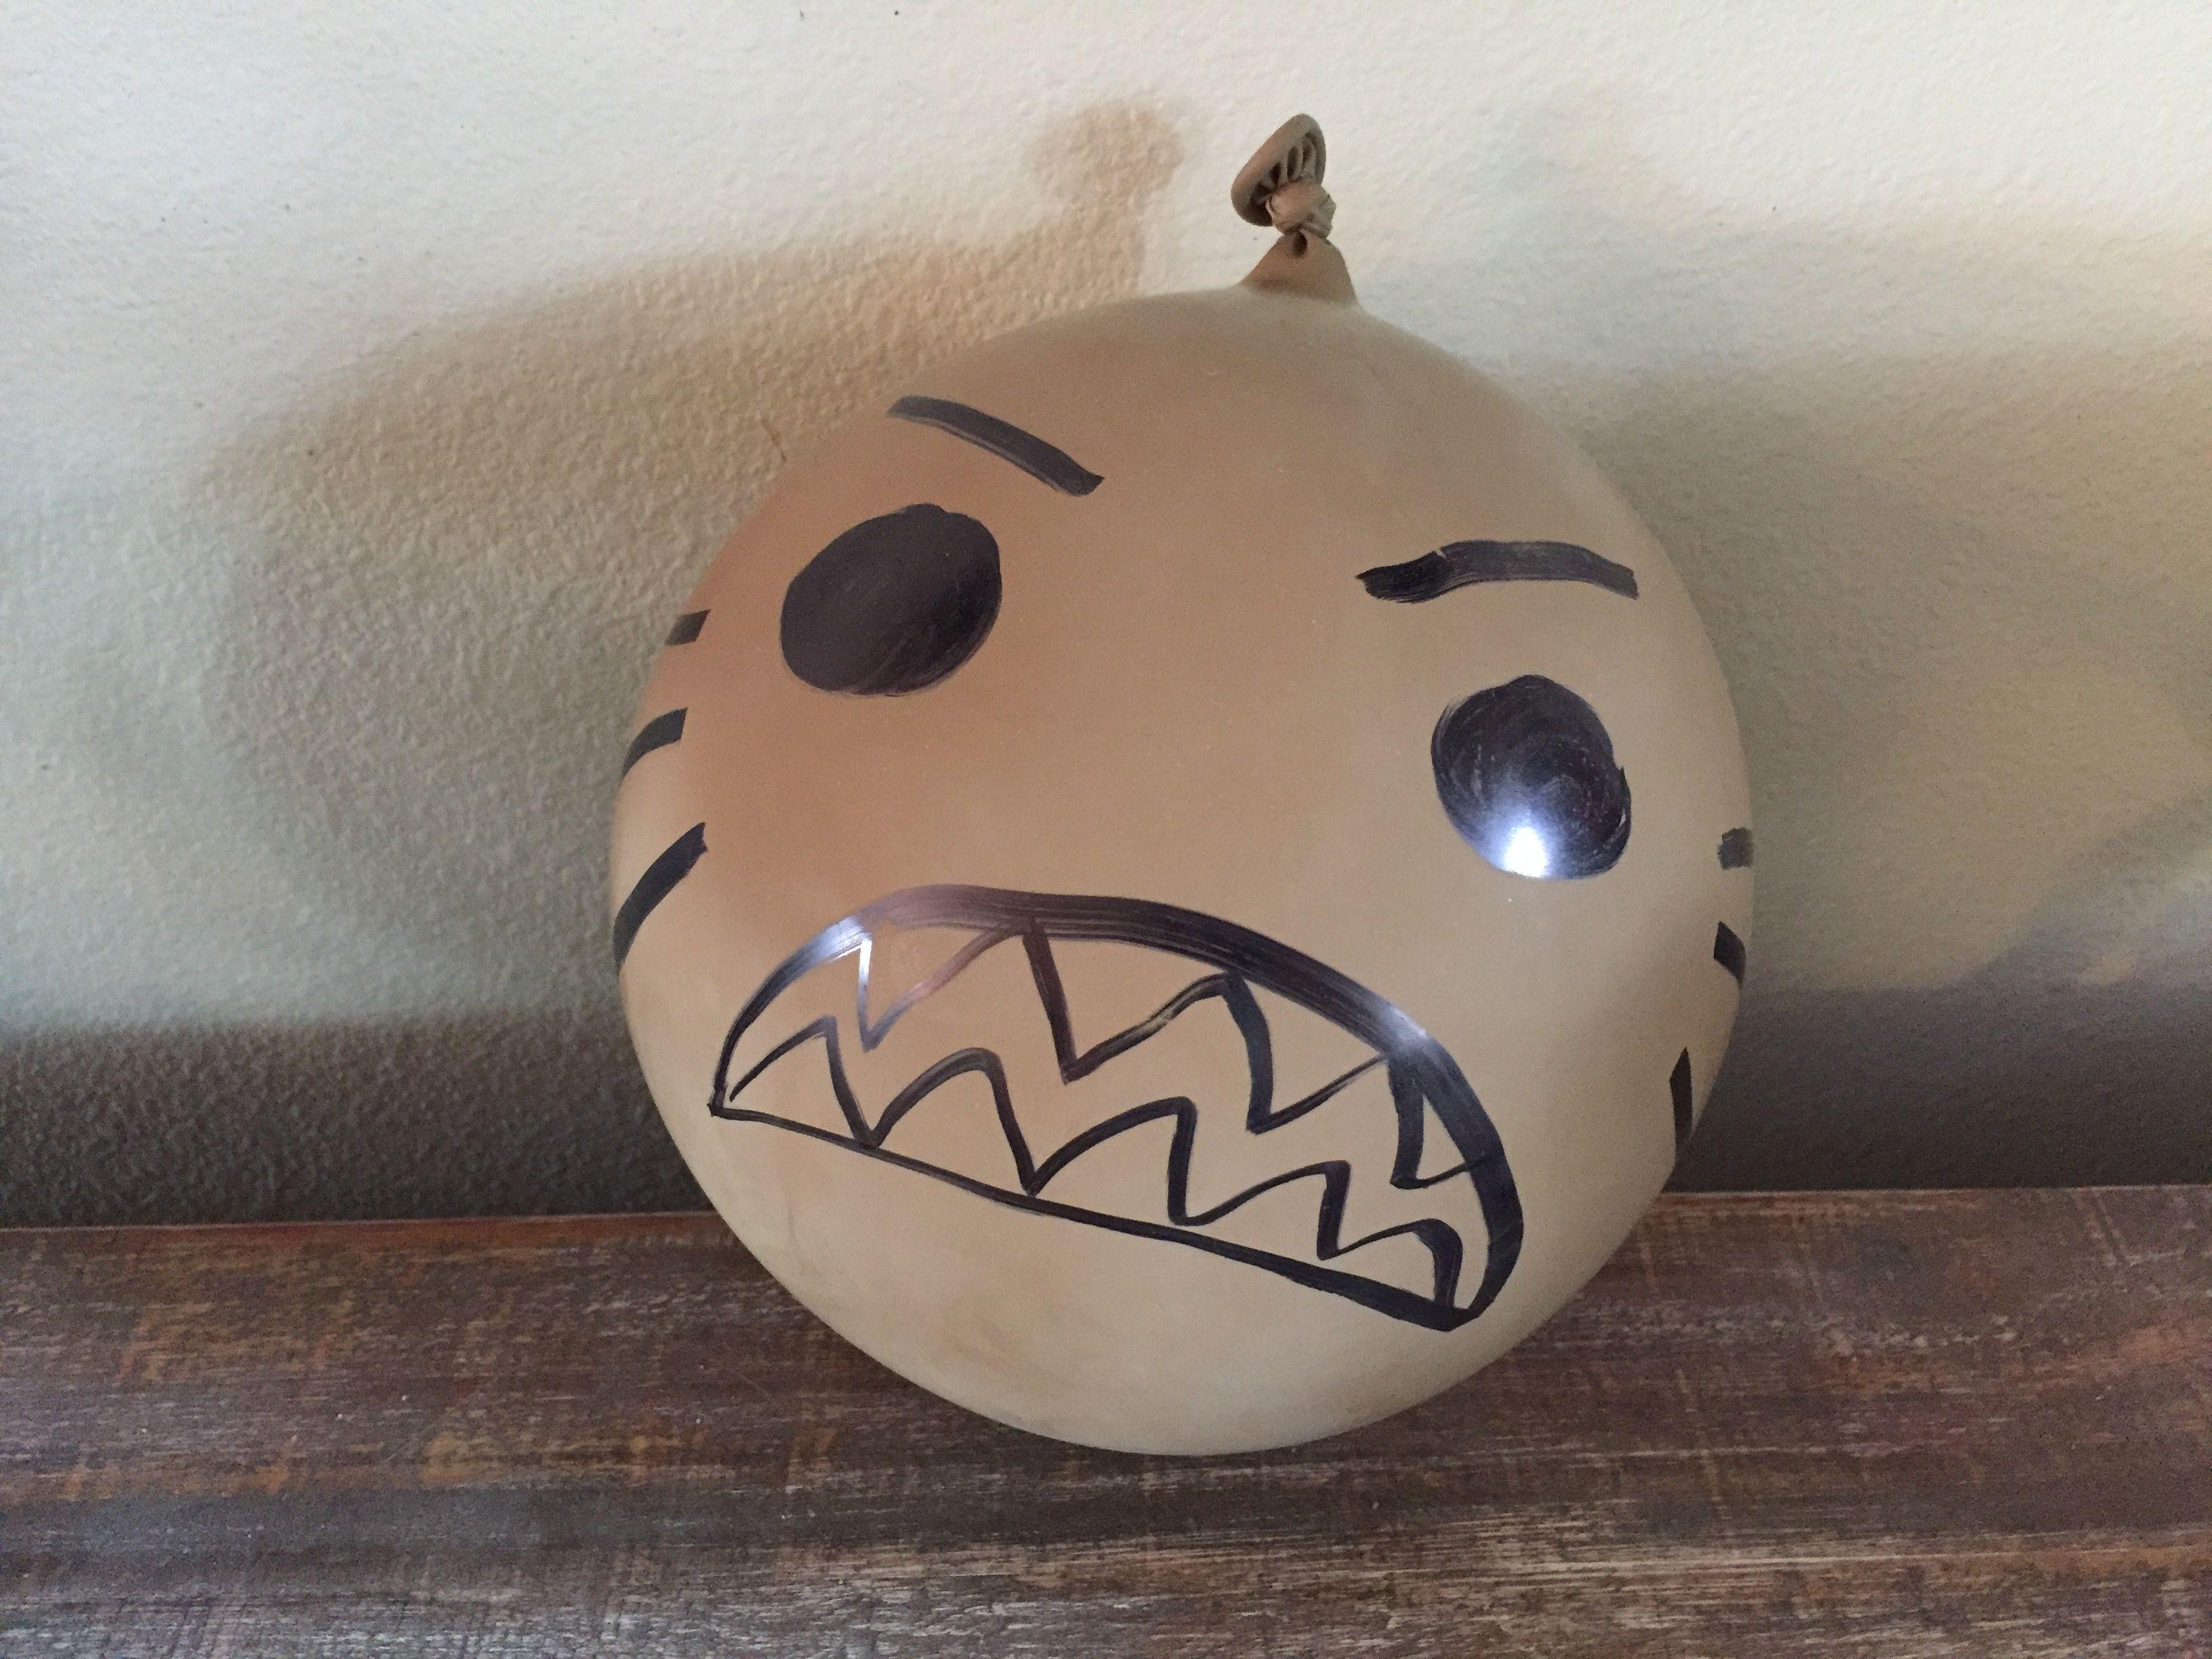 Moana Party Game Keep The Kakamora Balloon Off Ground Till All Kids Arrive Idea